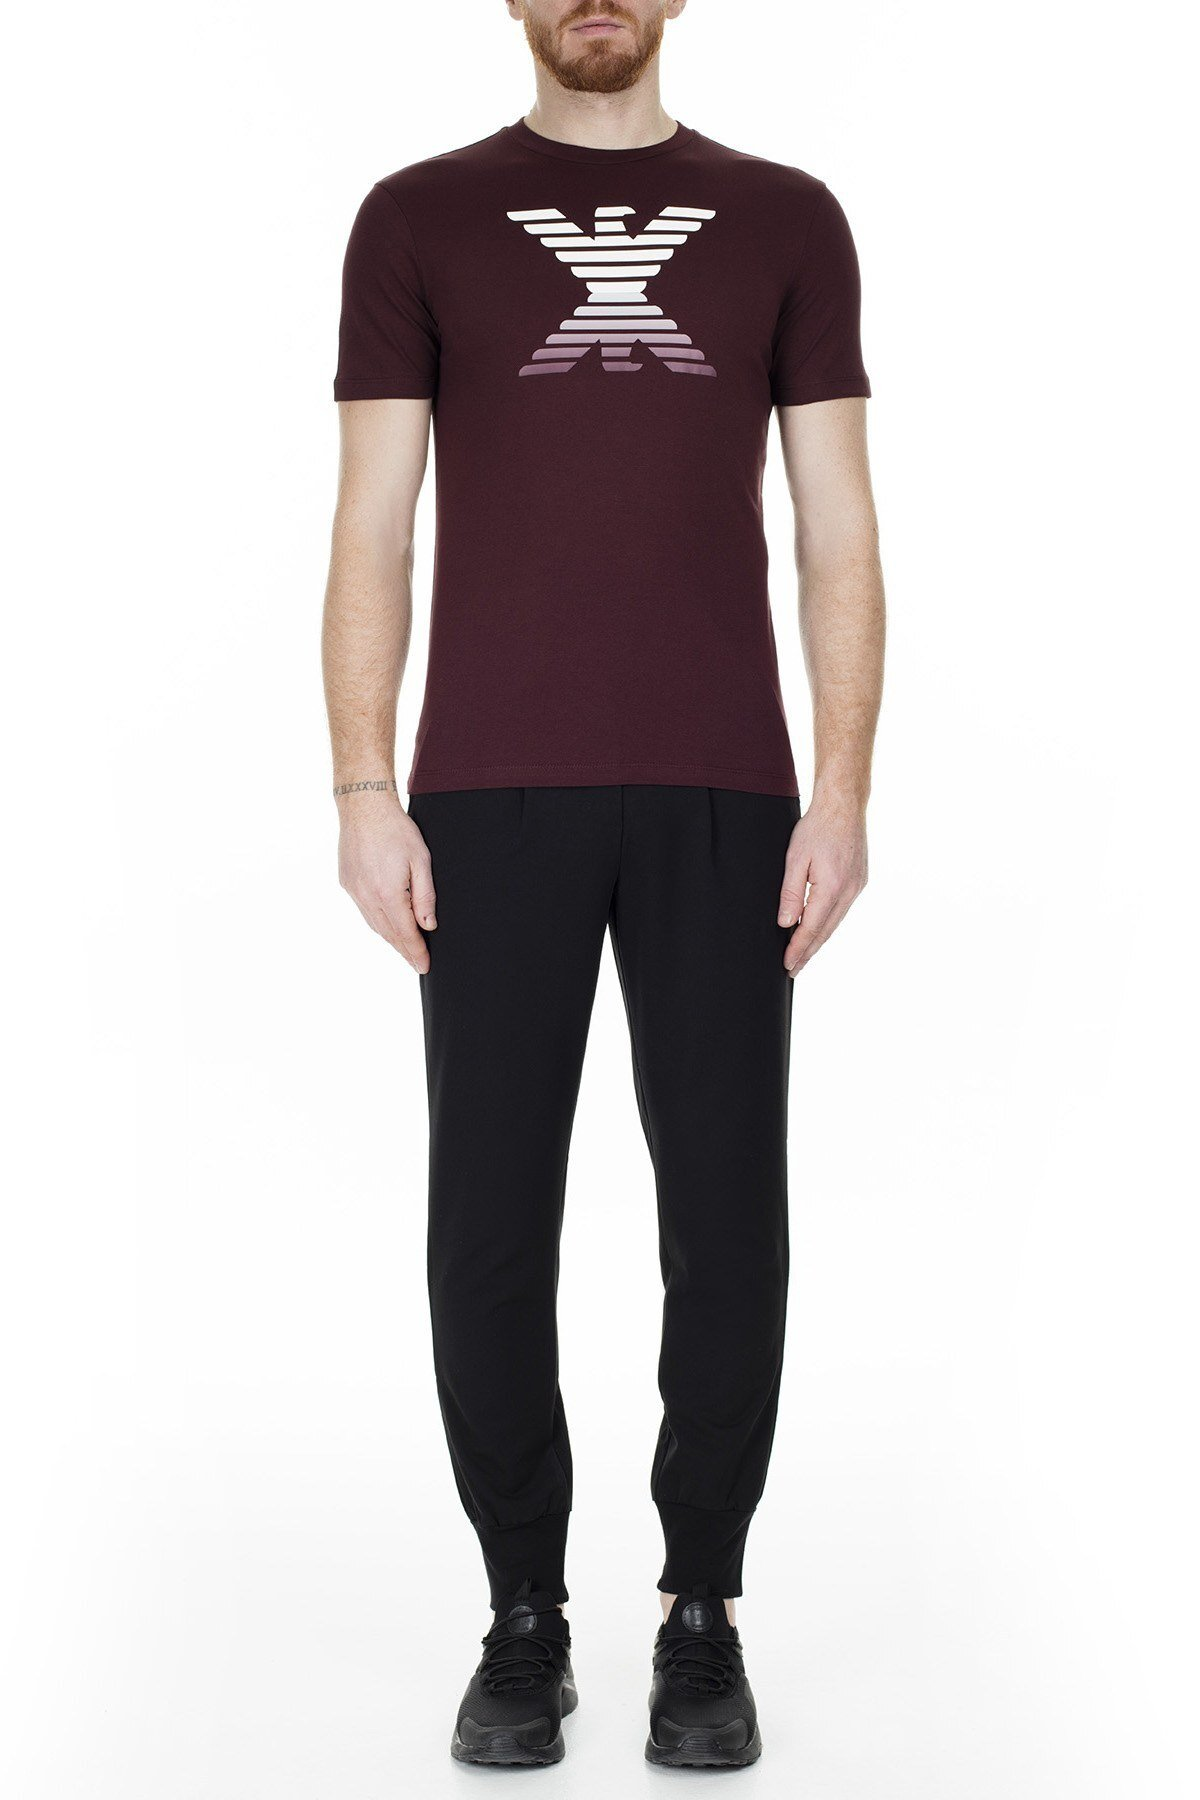 Emporio Armani Erkek T Shirt 6G1TC3 1J00Z 0340 BORDO